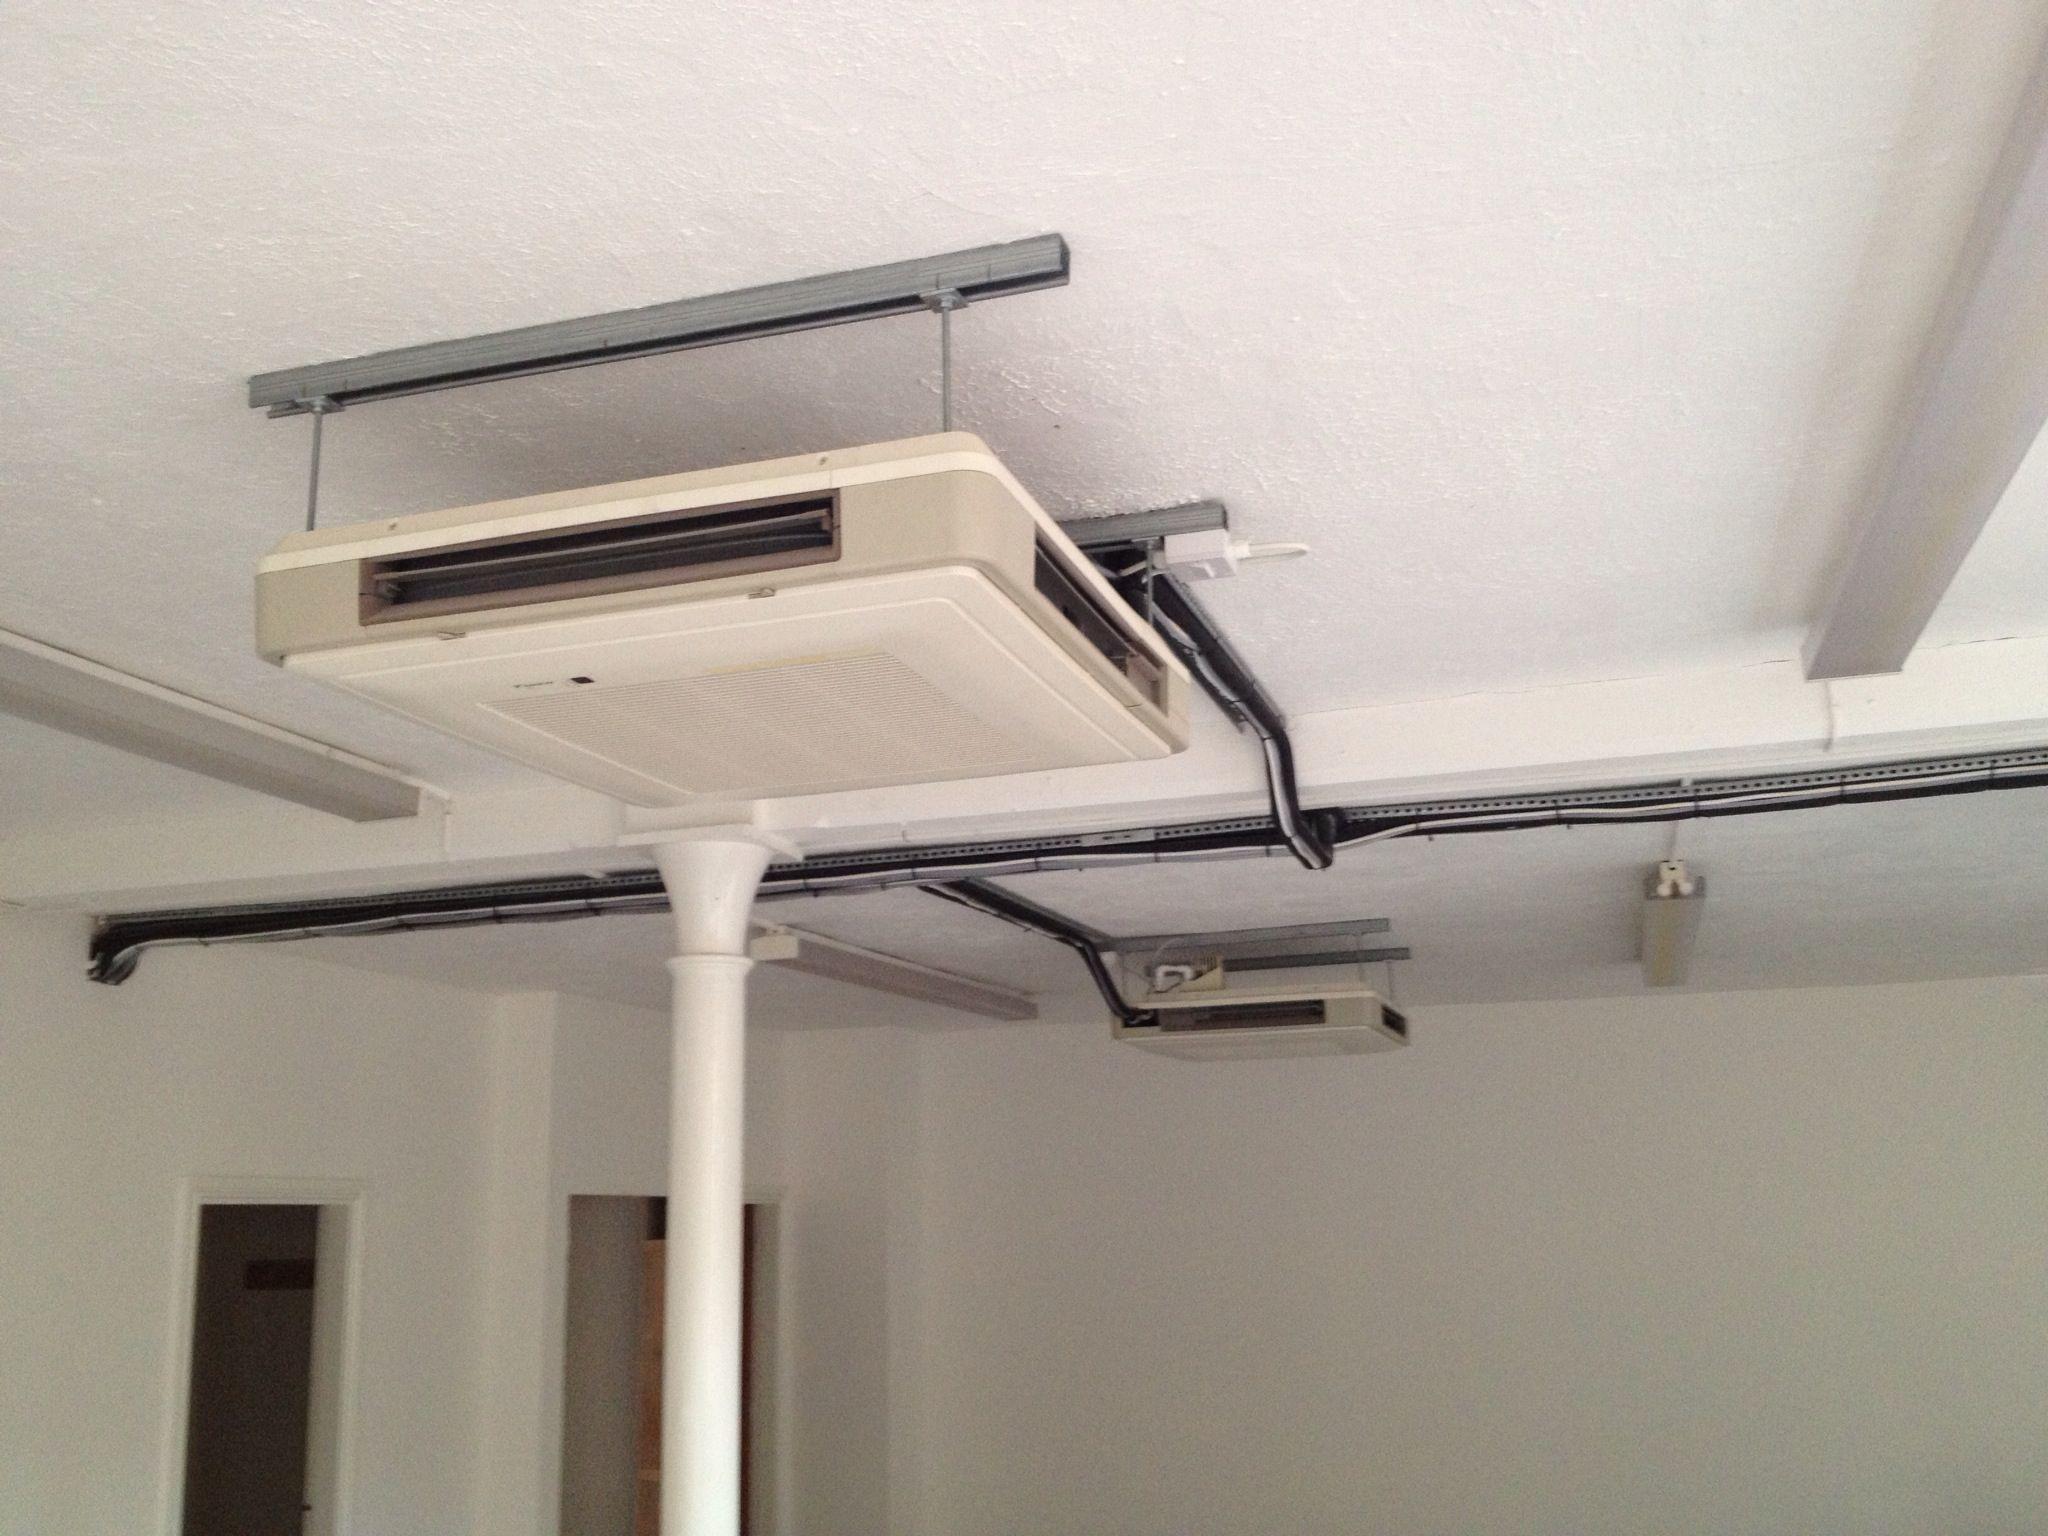 Daikin UnderCeiling Suspended air conditioning installed